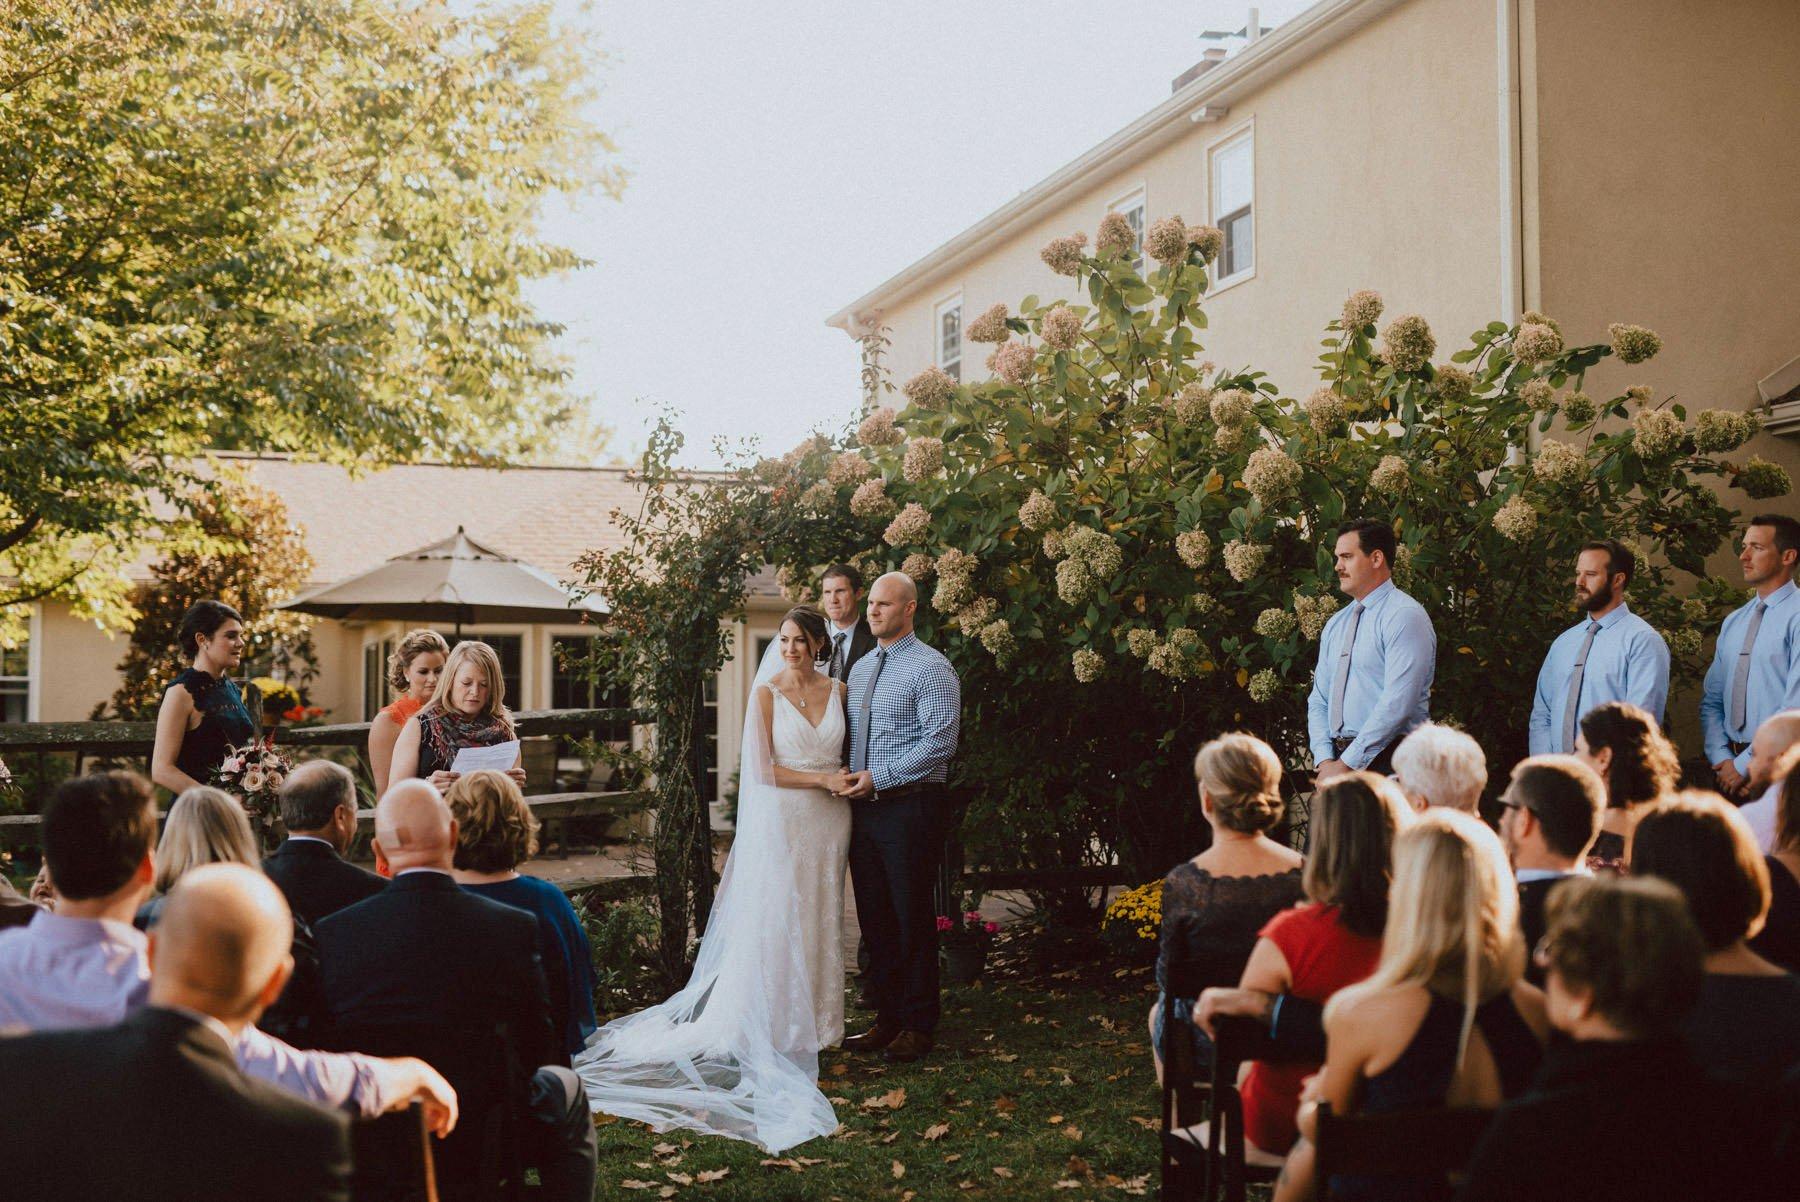 faunbrook-bed-and-breakfast-wedding-61.jpg